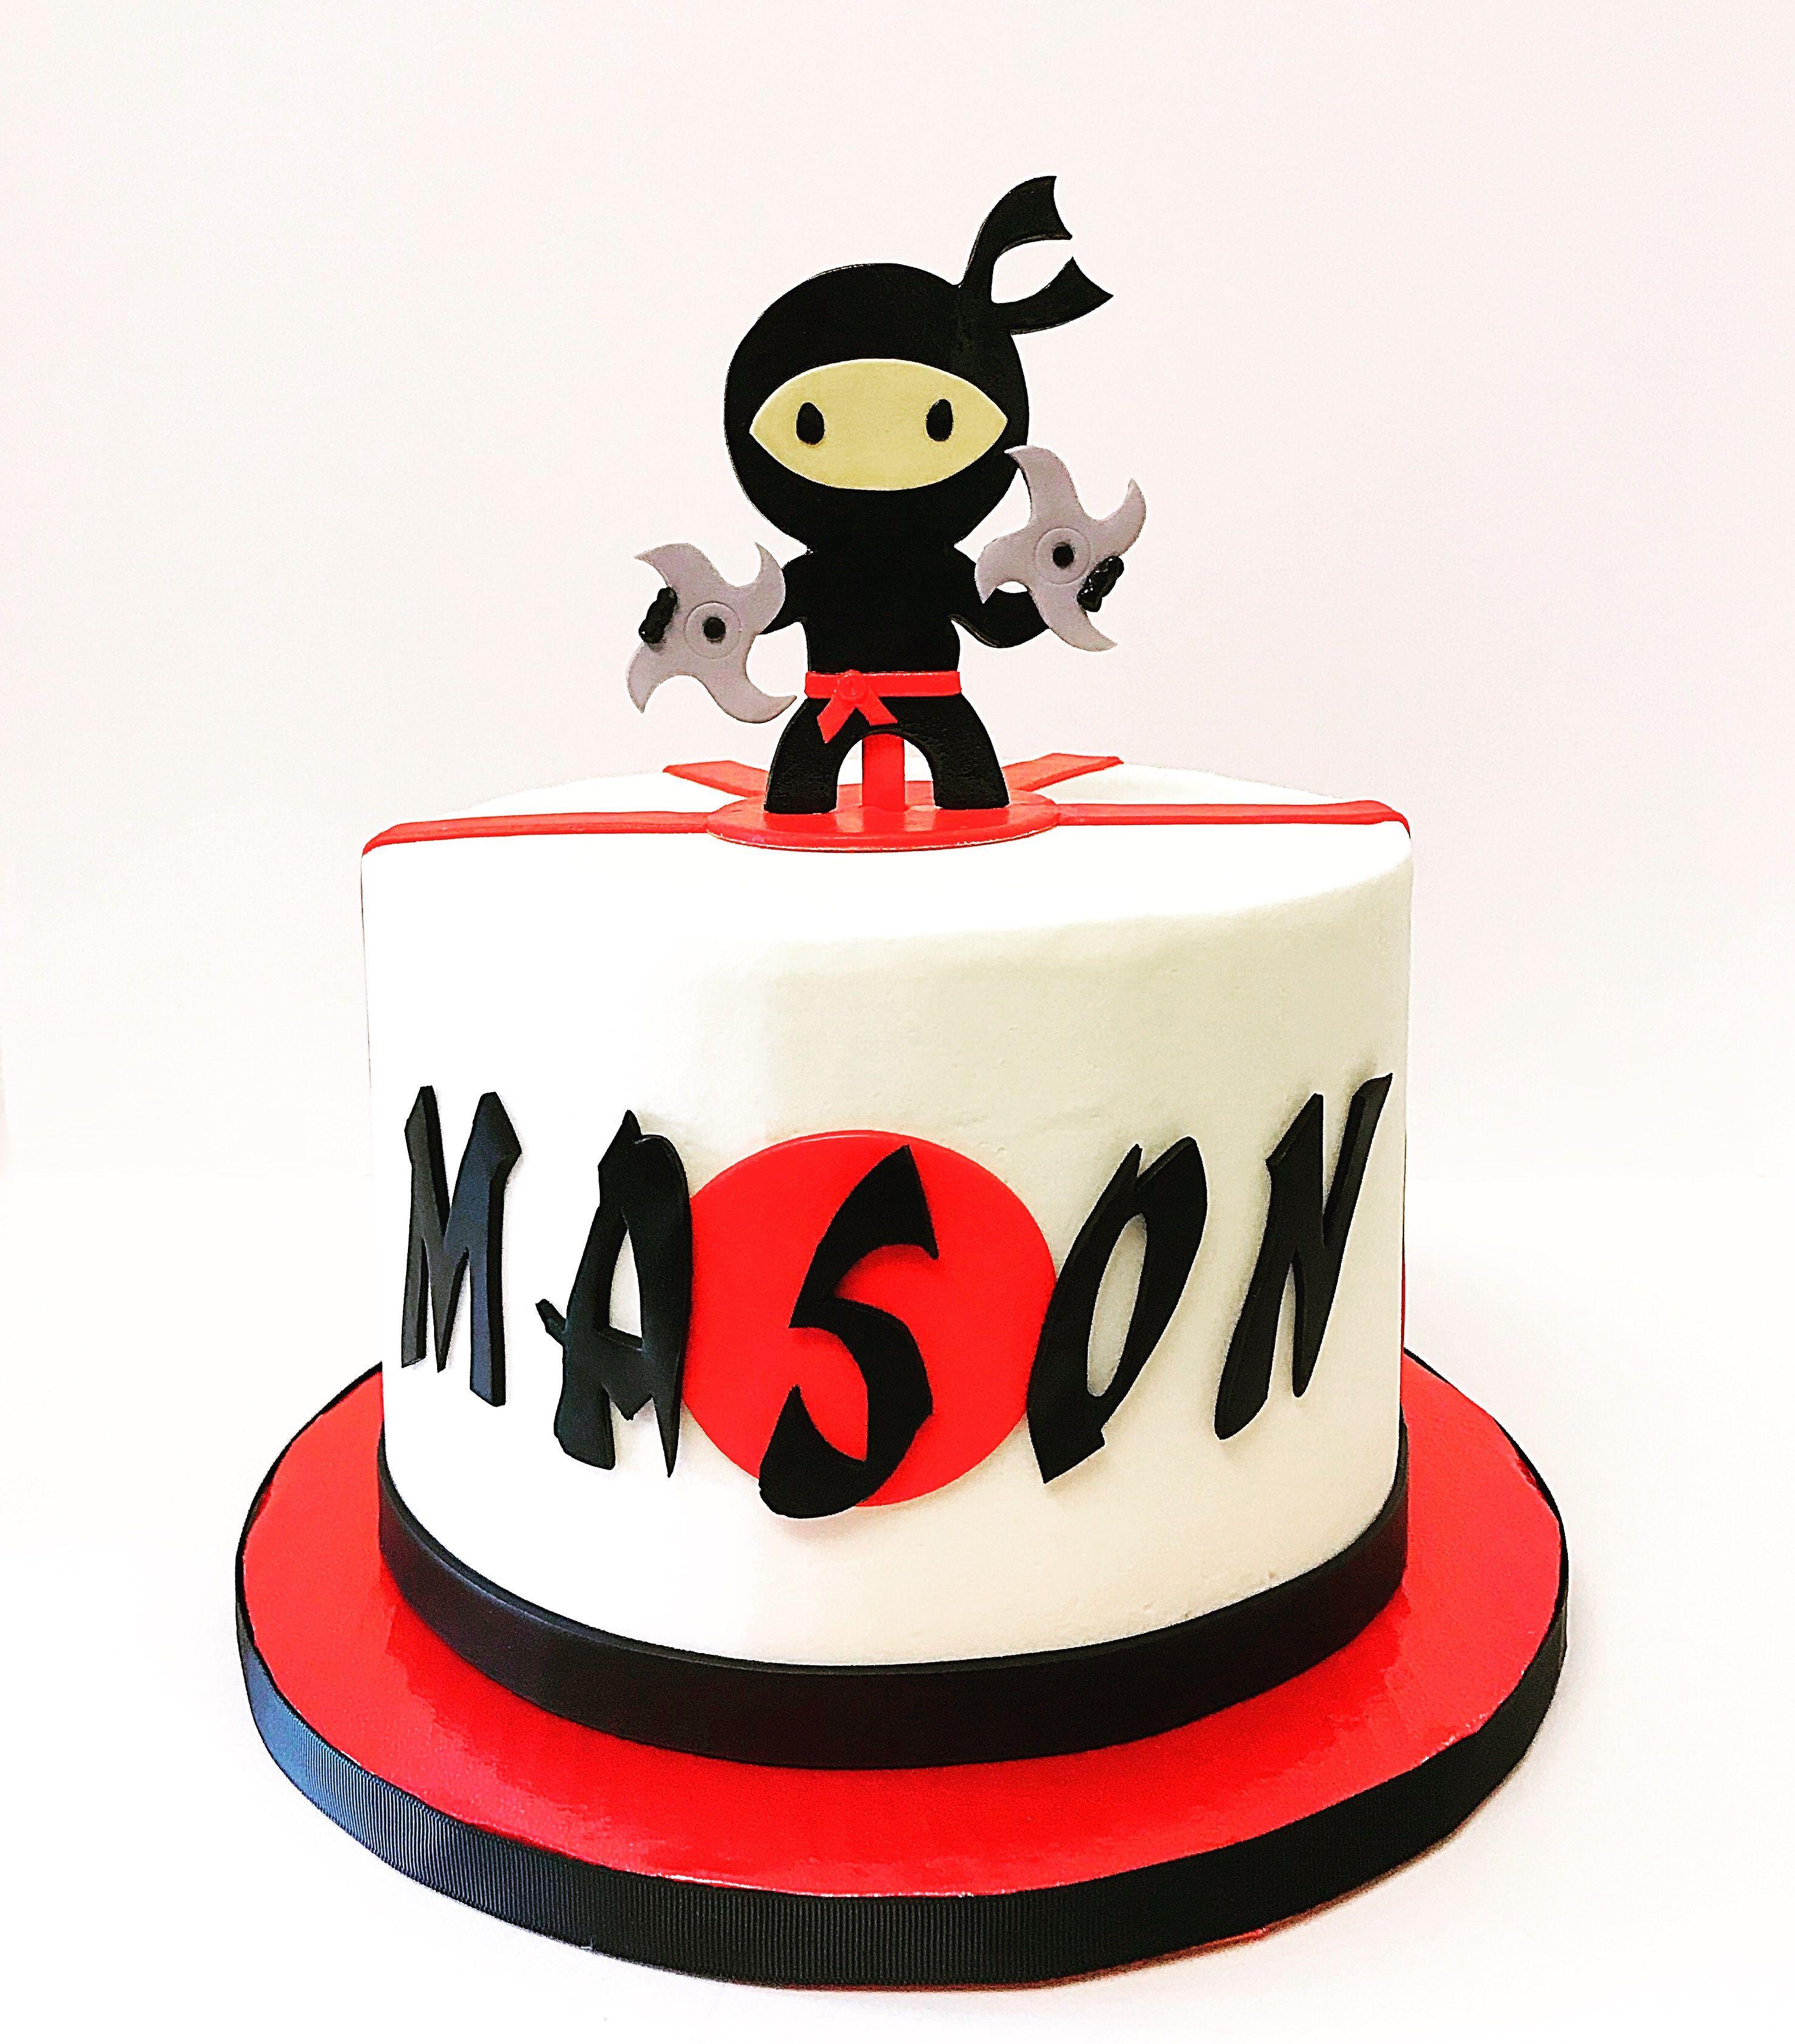 Stupendous Ninja Cake With Images Ninja Birthday Cake Ninja Cake Ninja Funny Birthday Cards Online Hendilapandamsfinfo